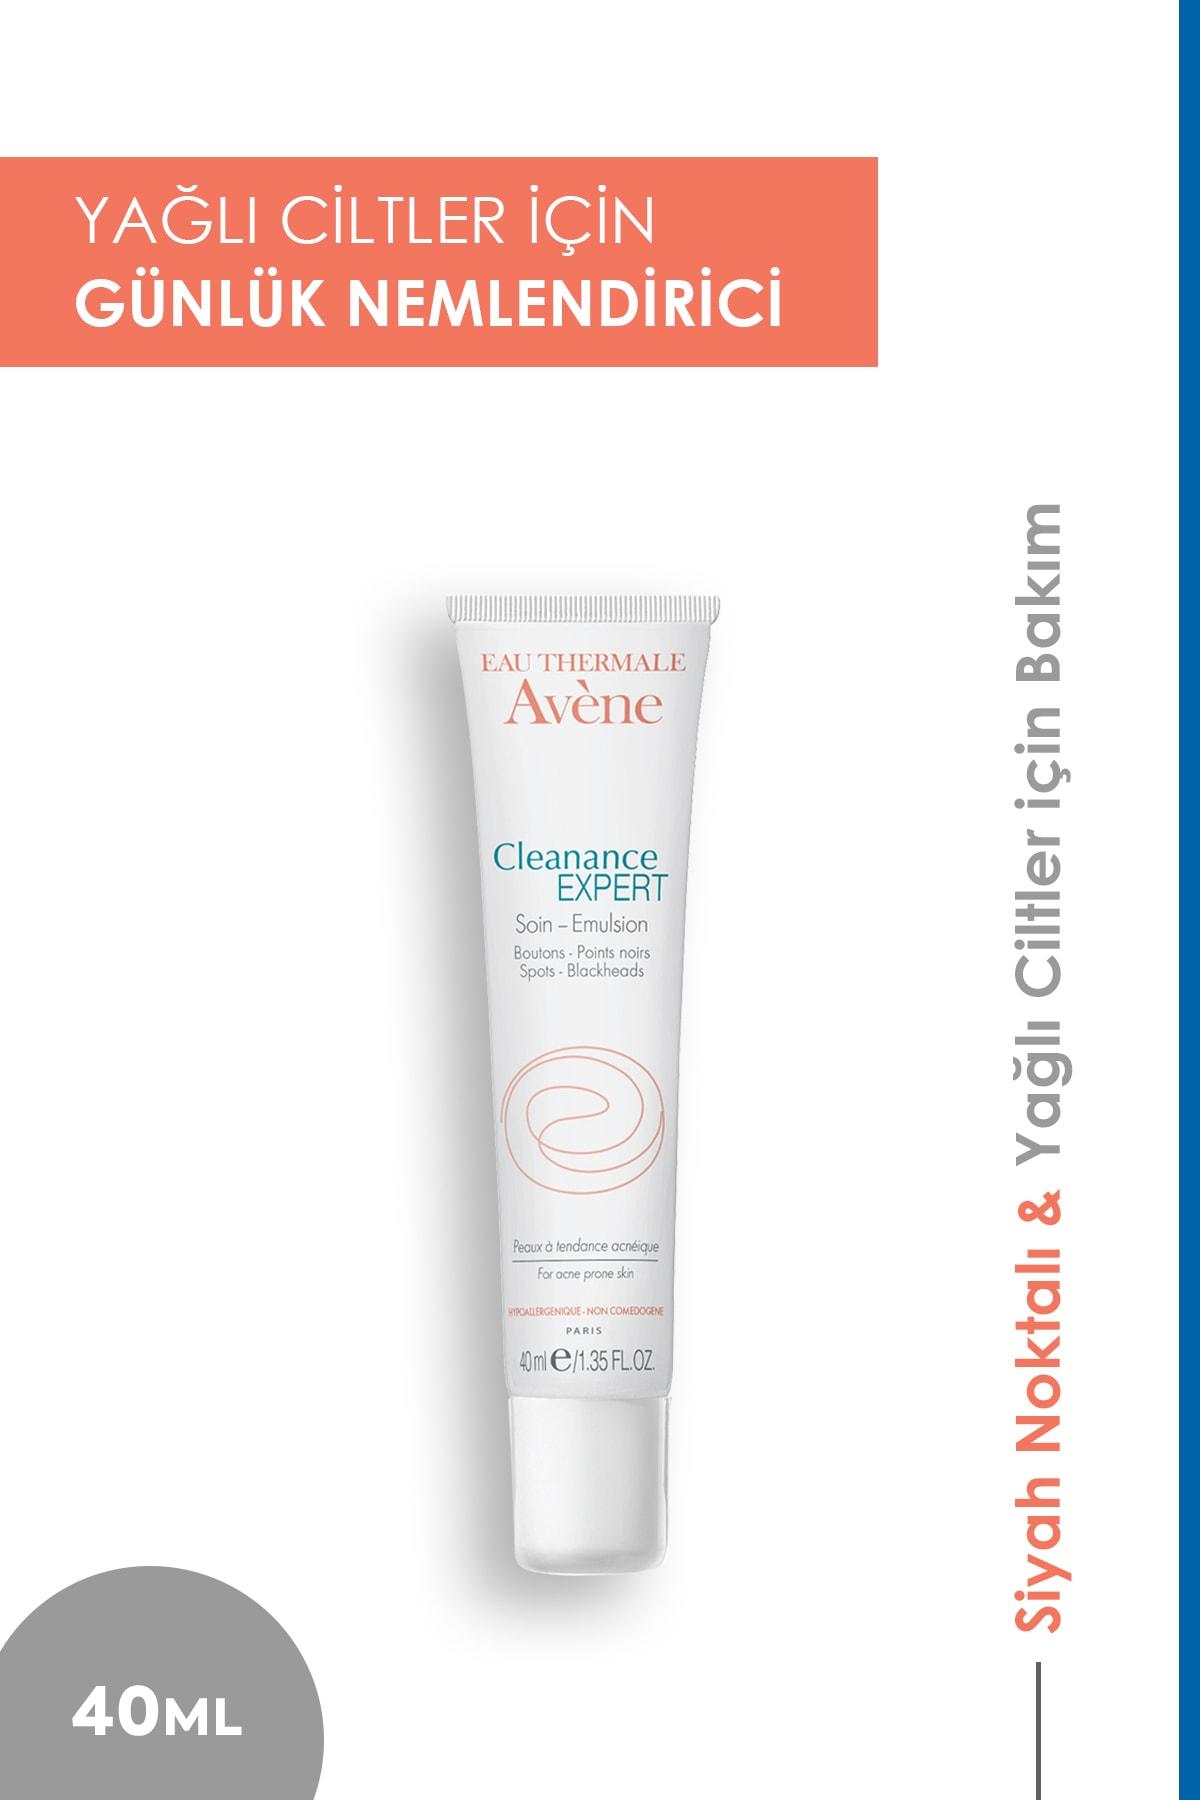 Avene Cleanance Expert Emulsion - Akneli Ciltler Için Bakım Kremi 40ml 1